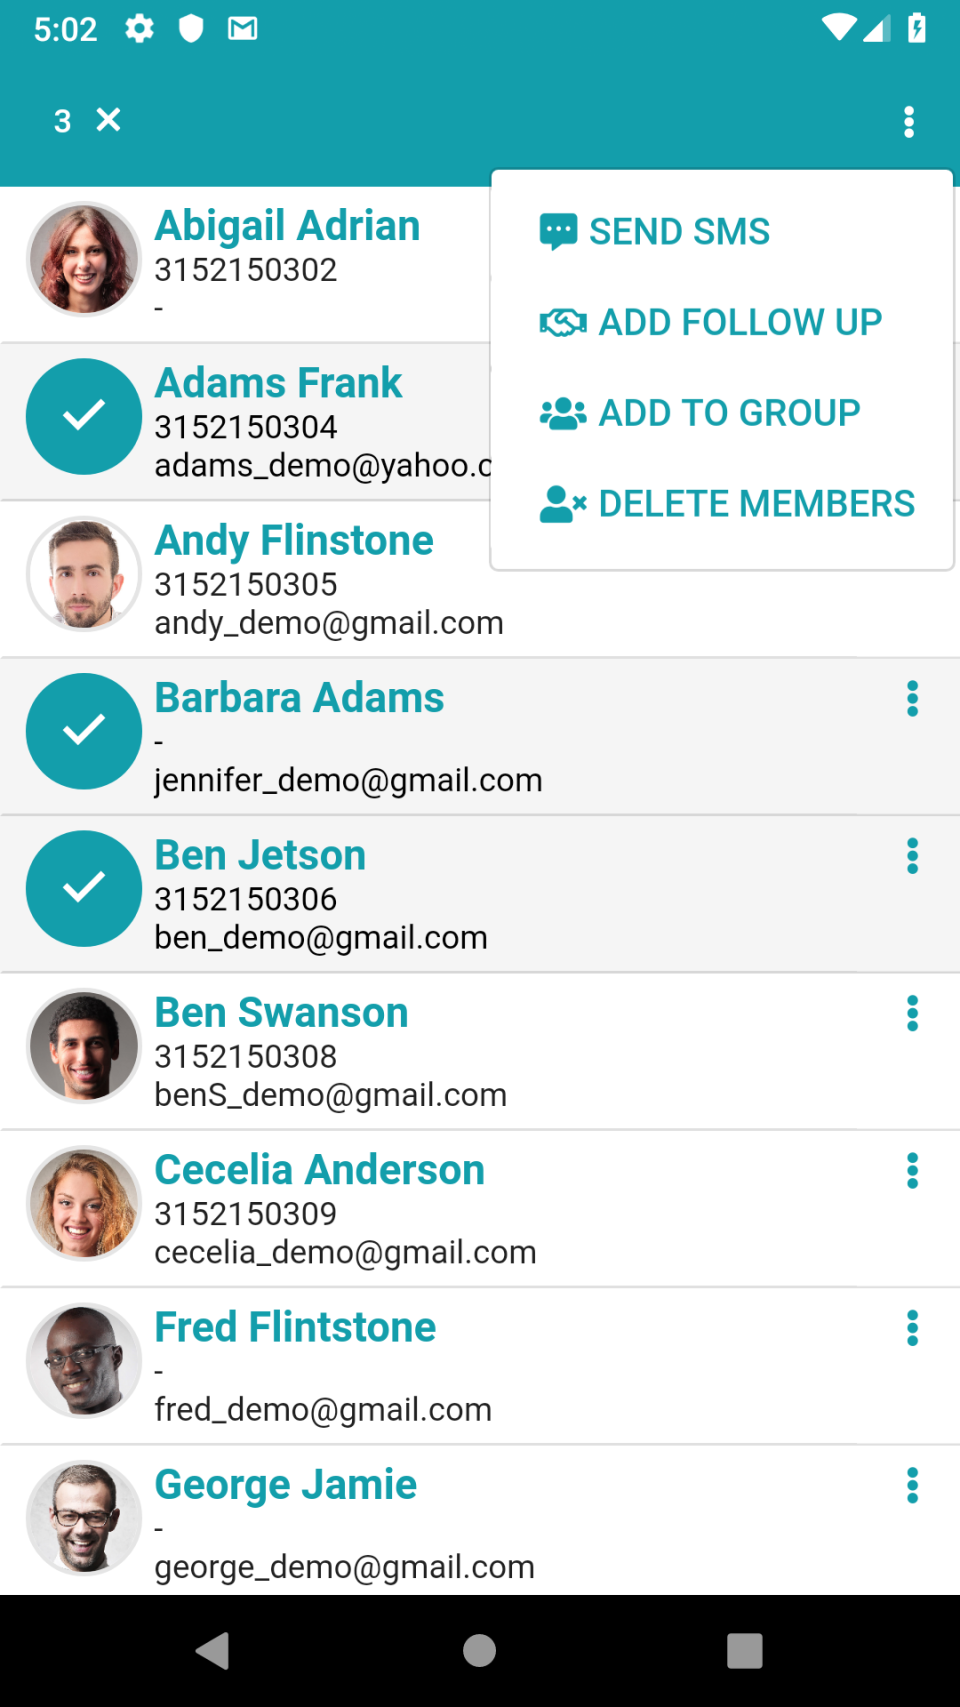 Organize member contact information